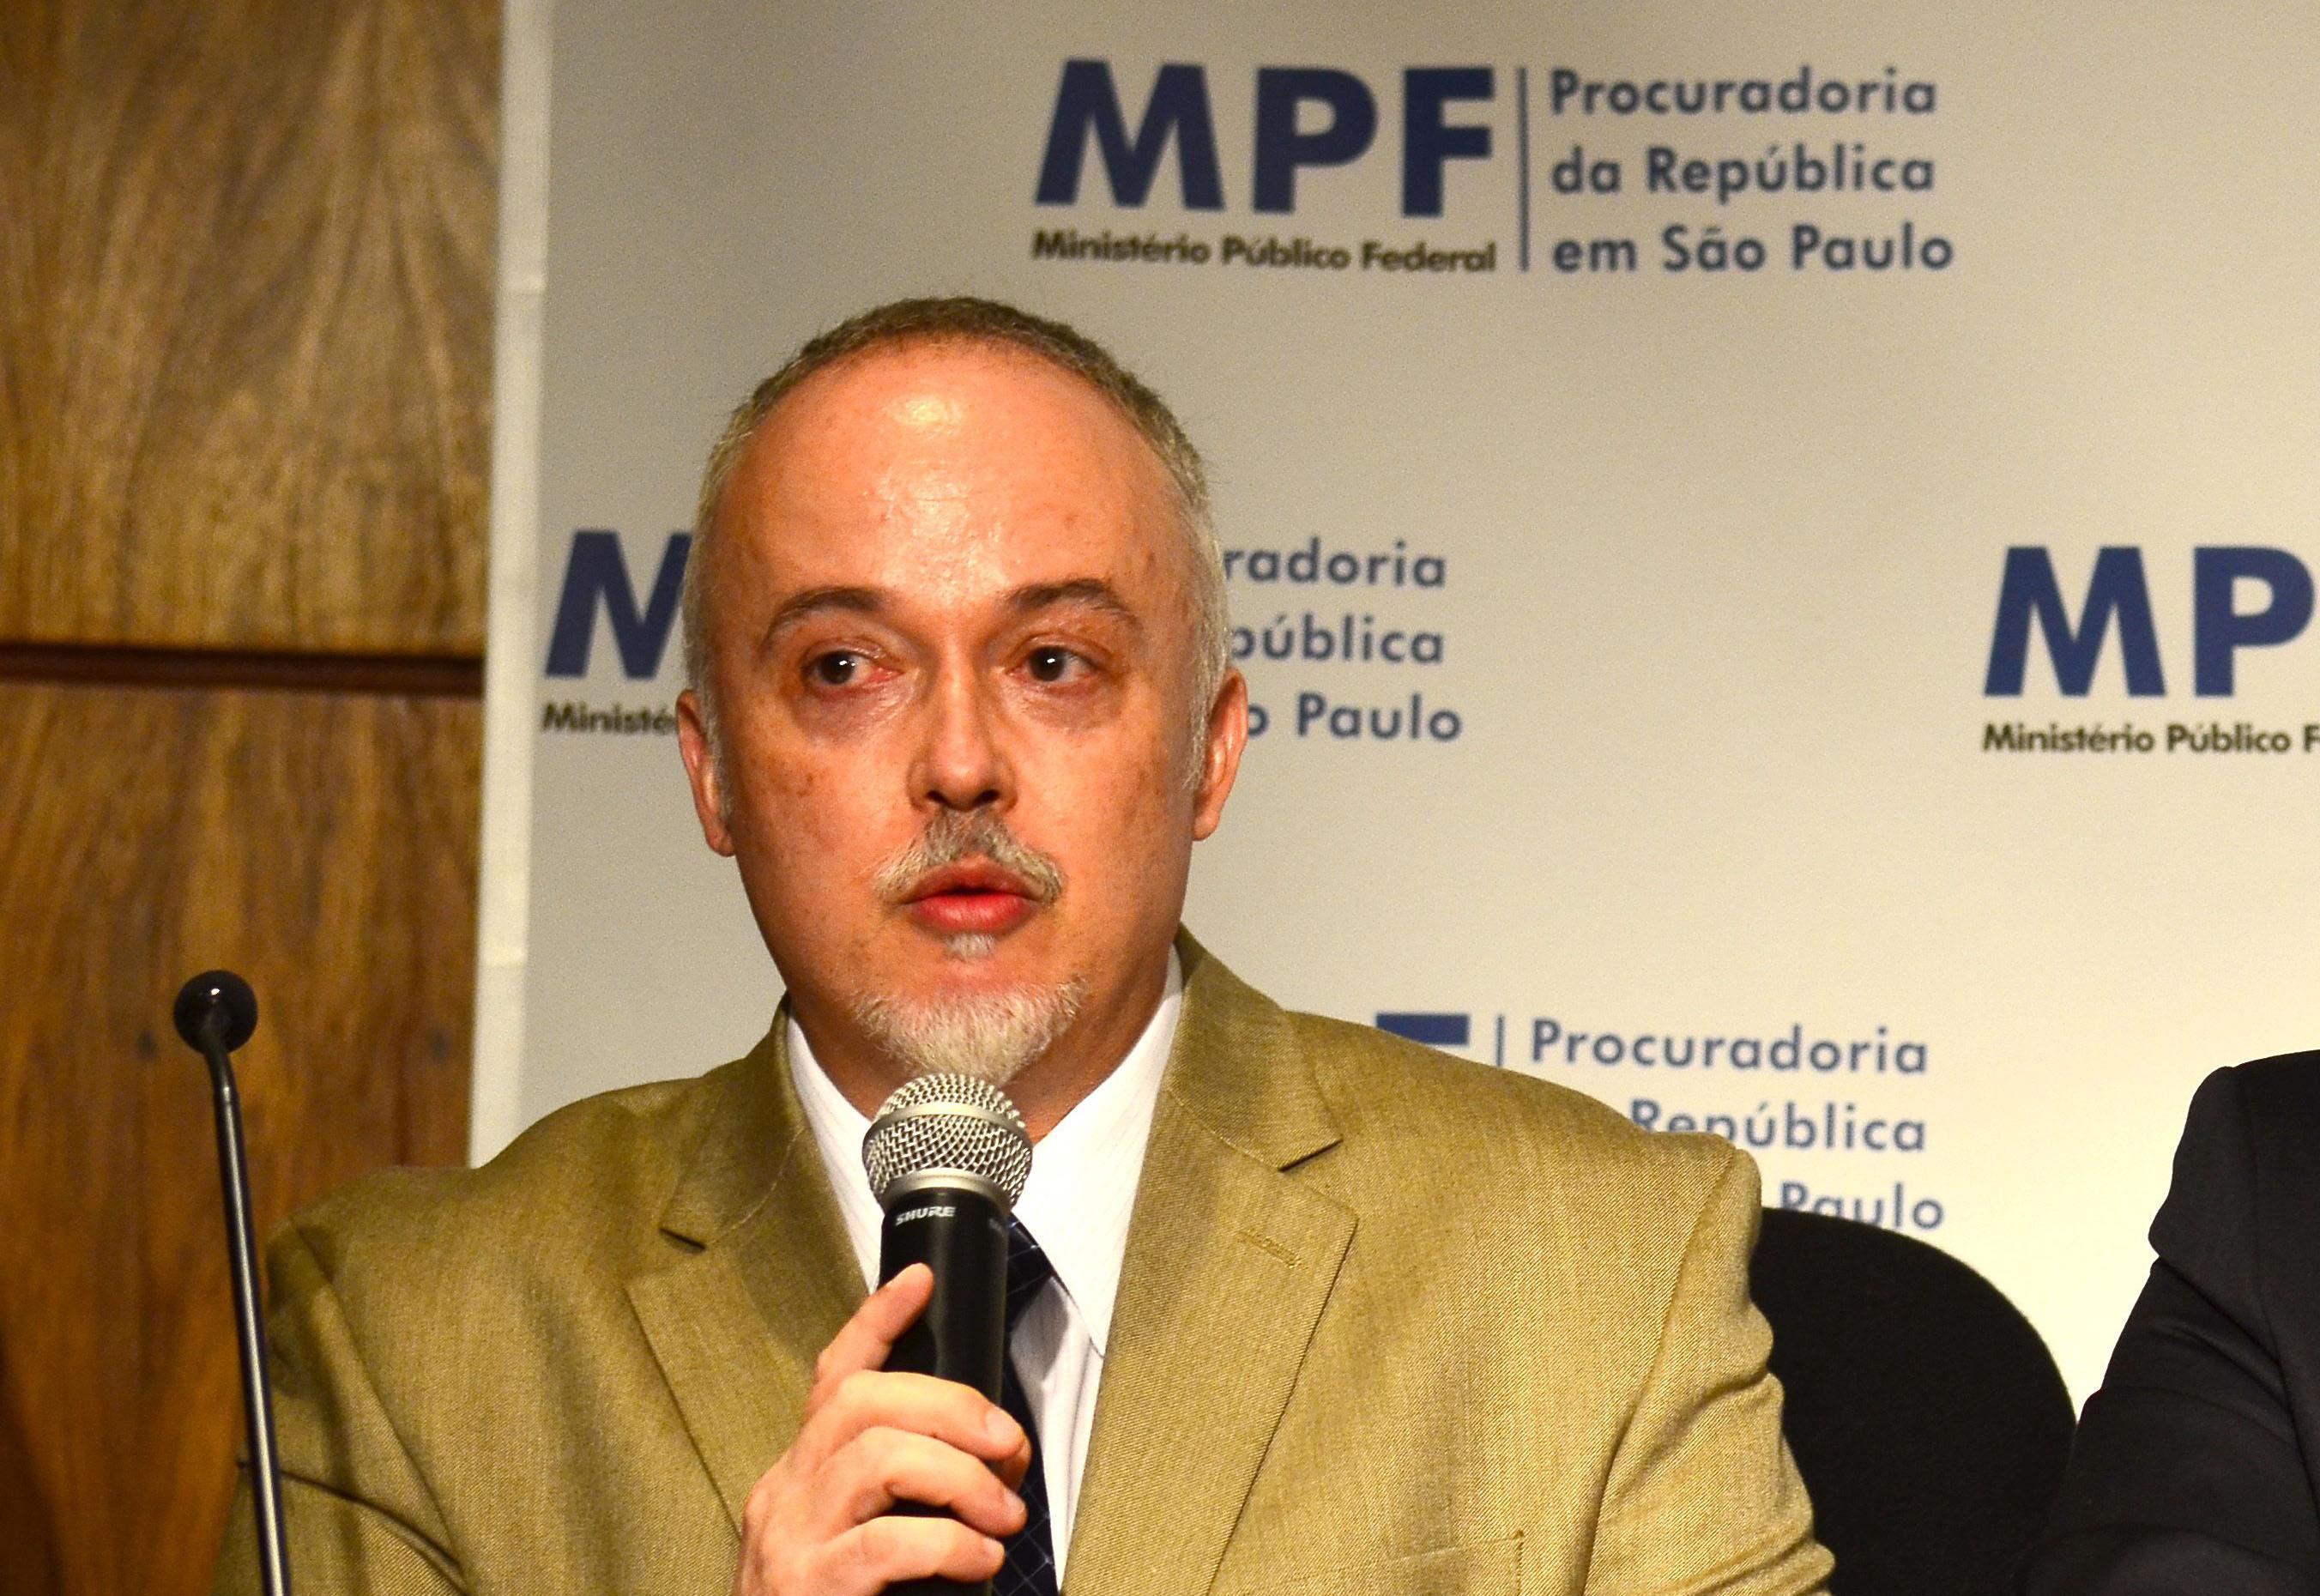 Carlos Fernando Lima: A mentira como método